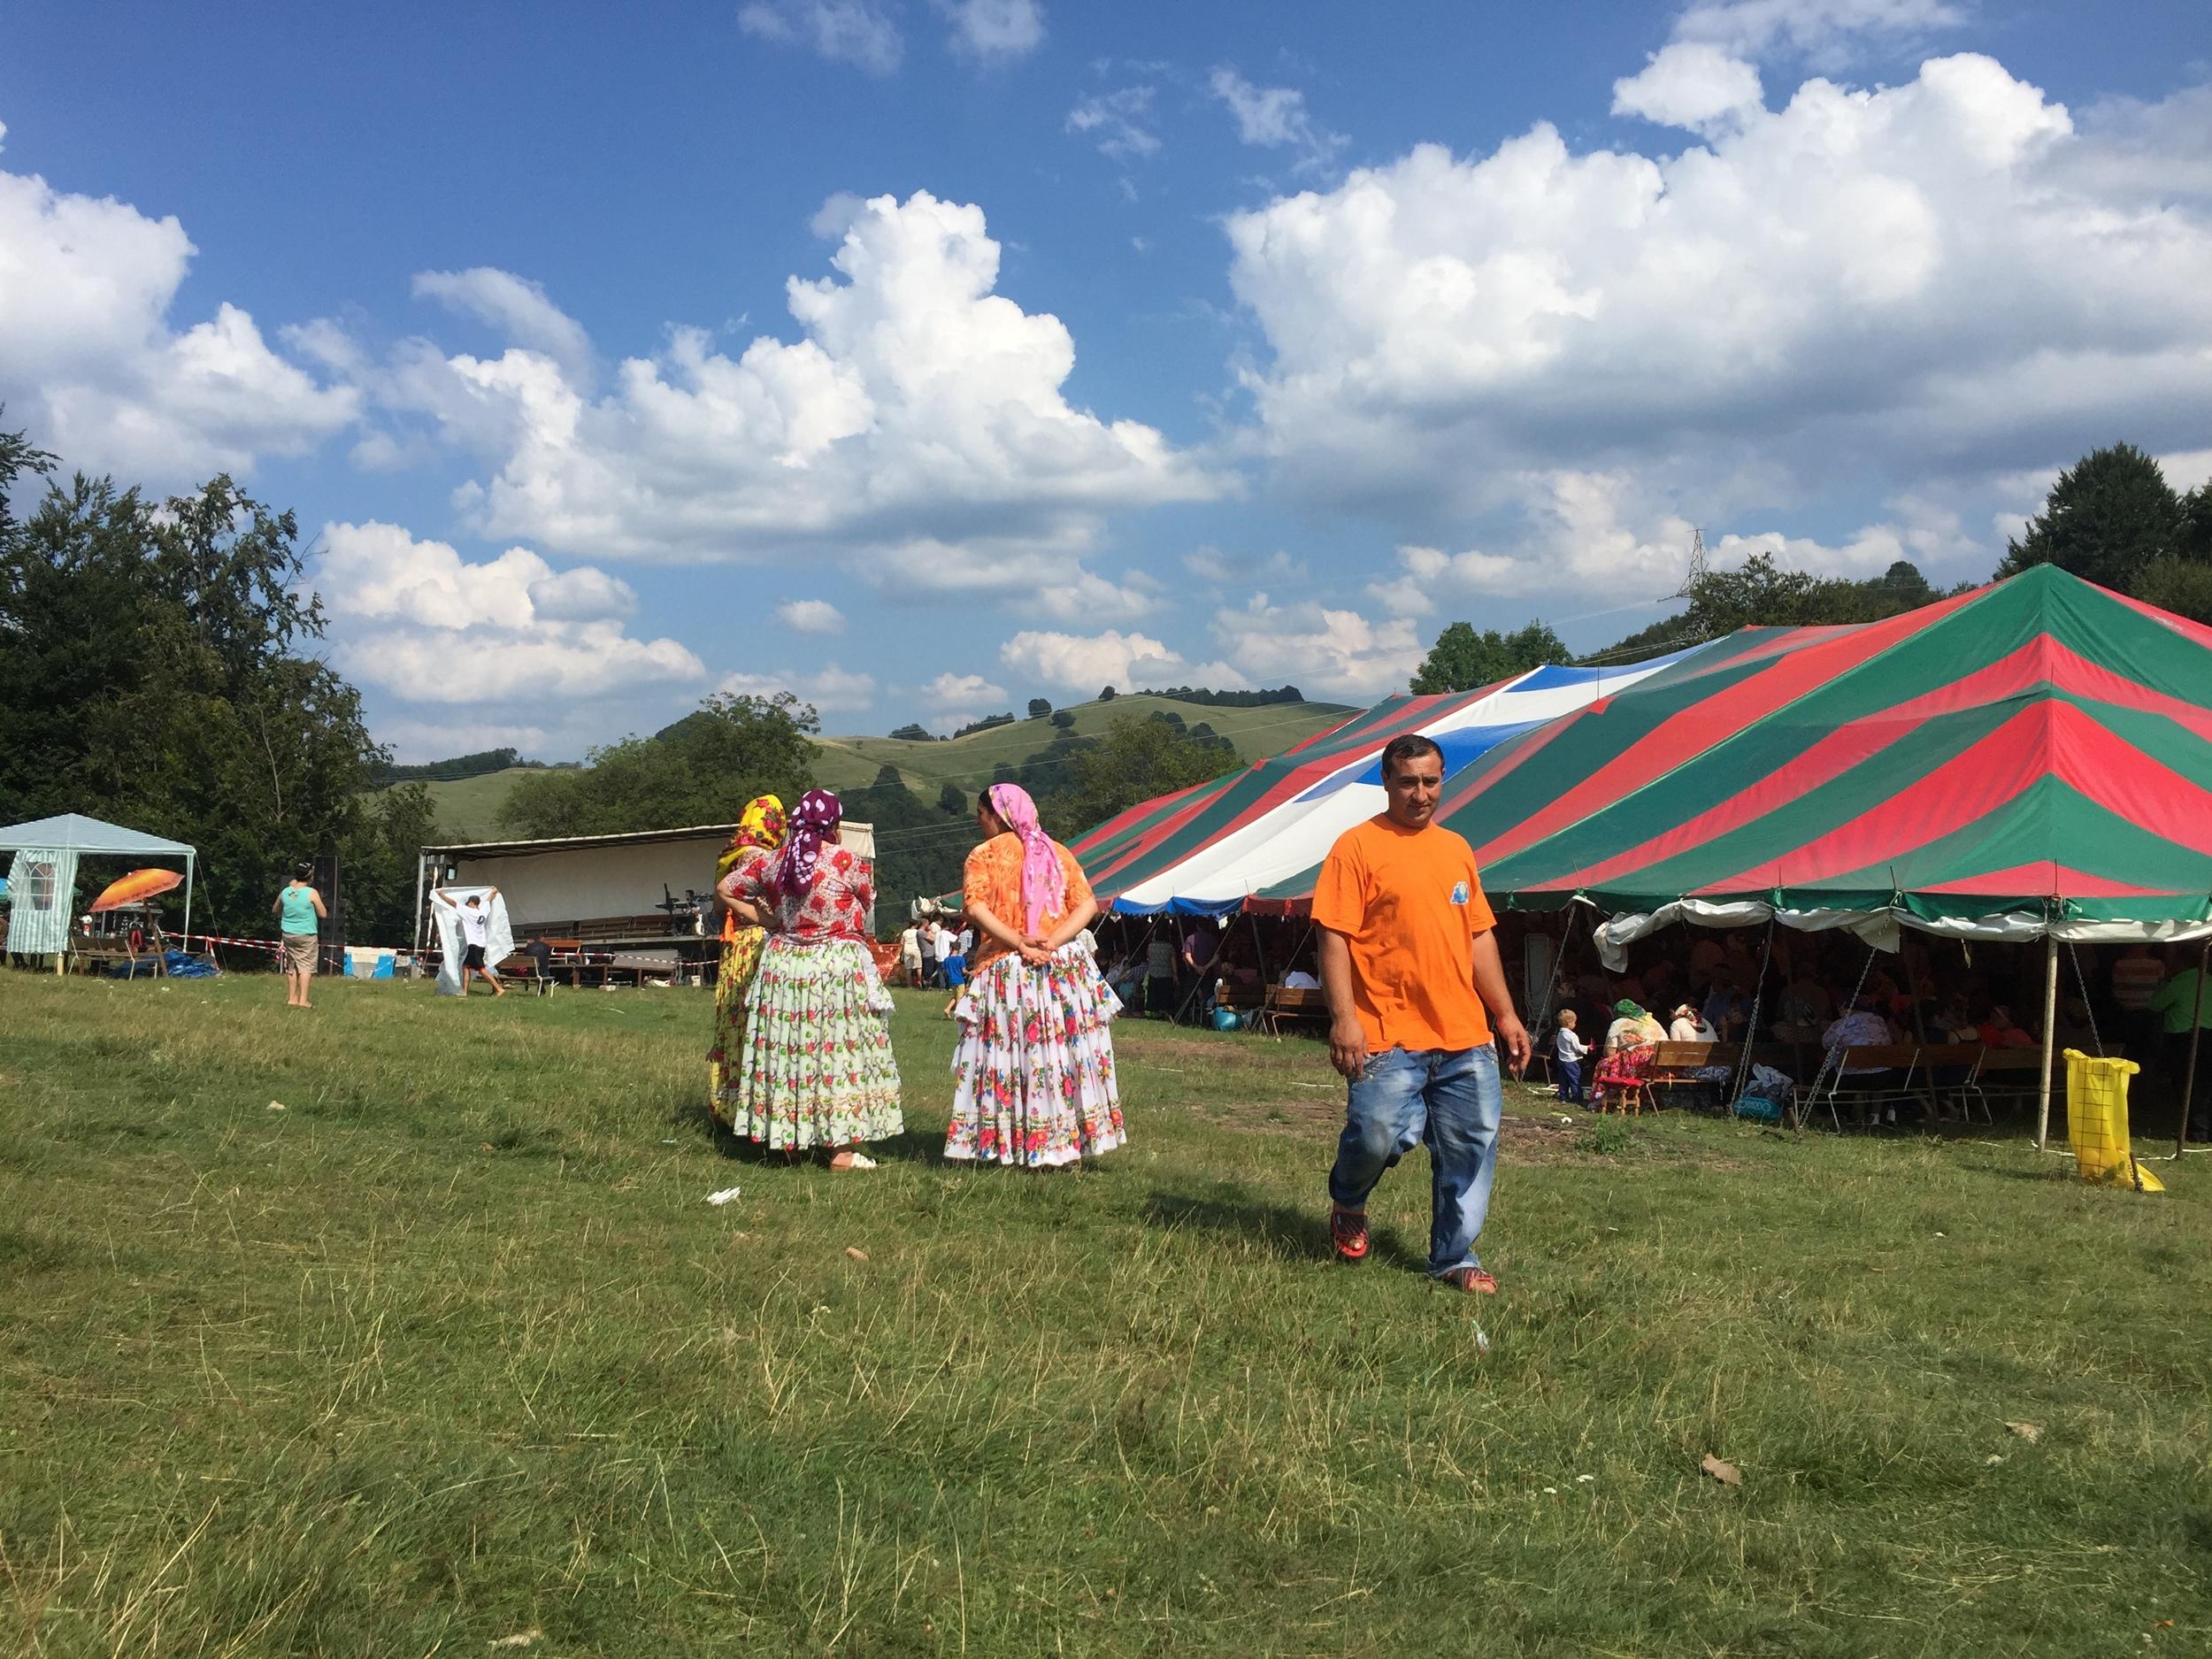 An evangelical festival.